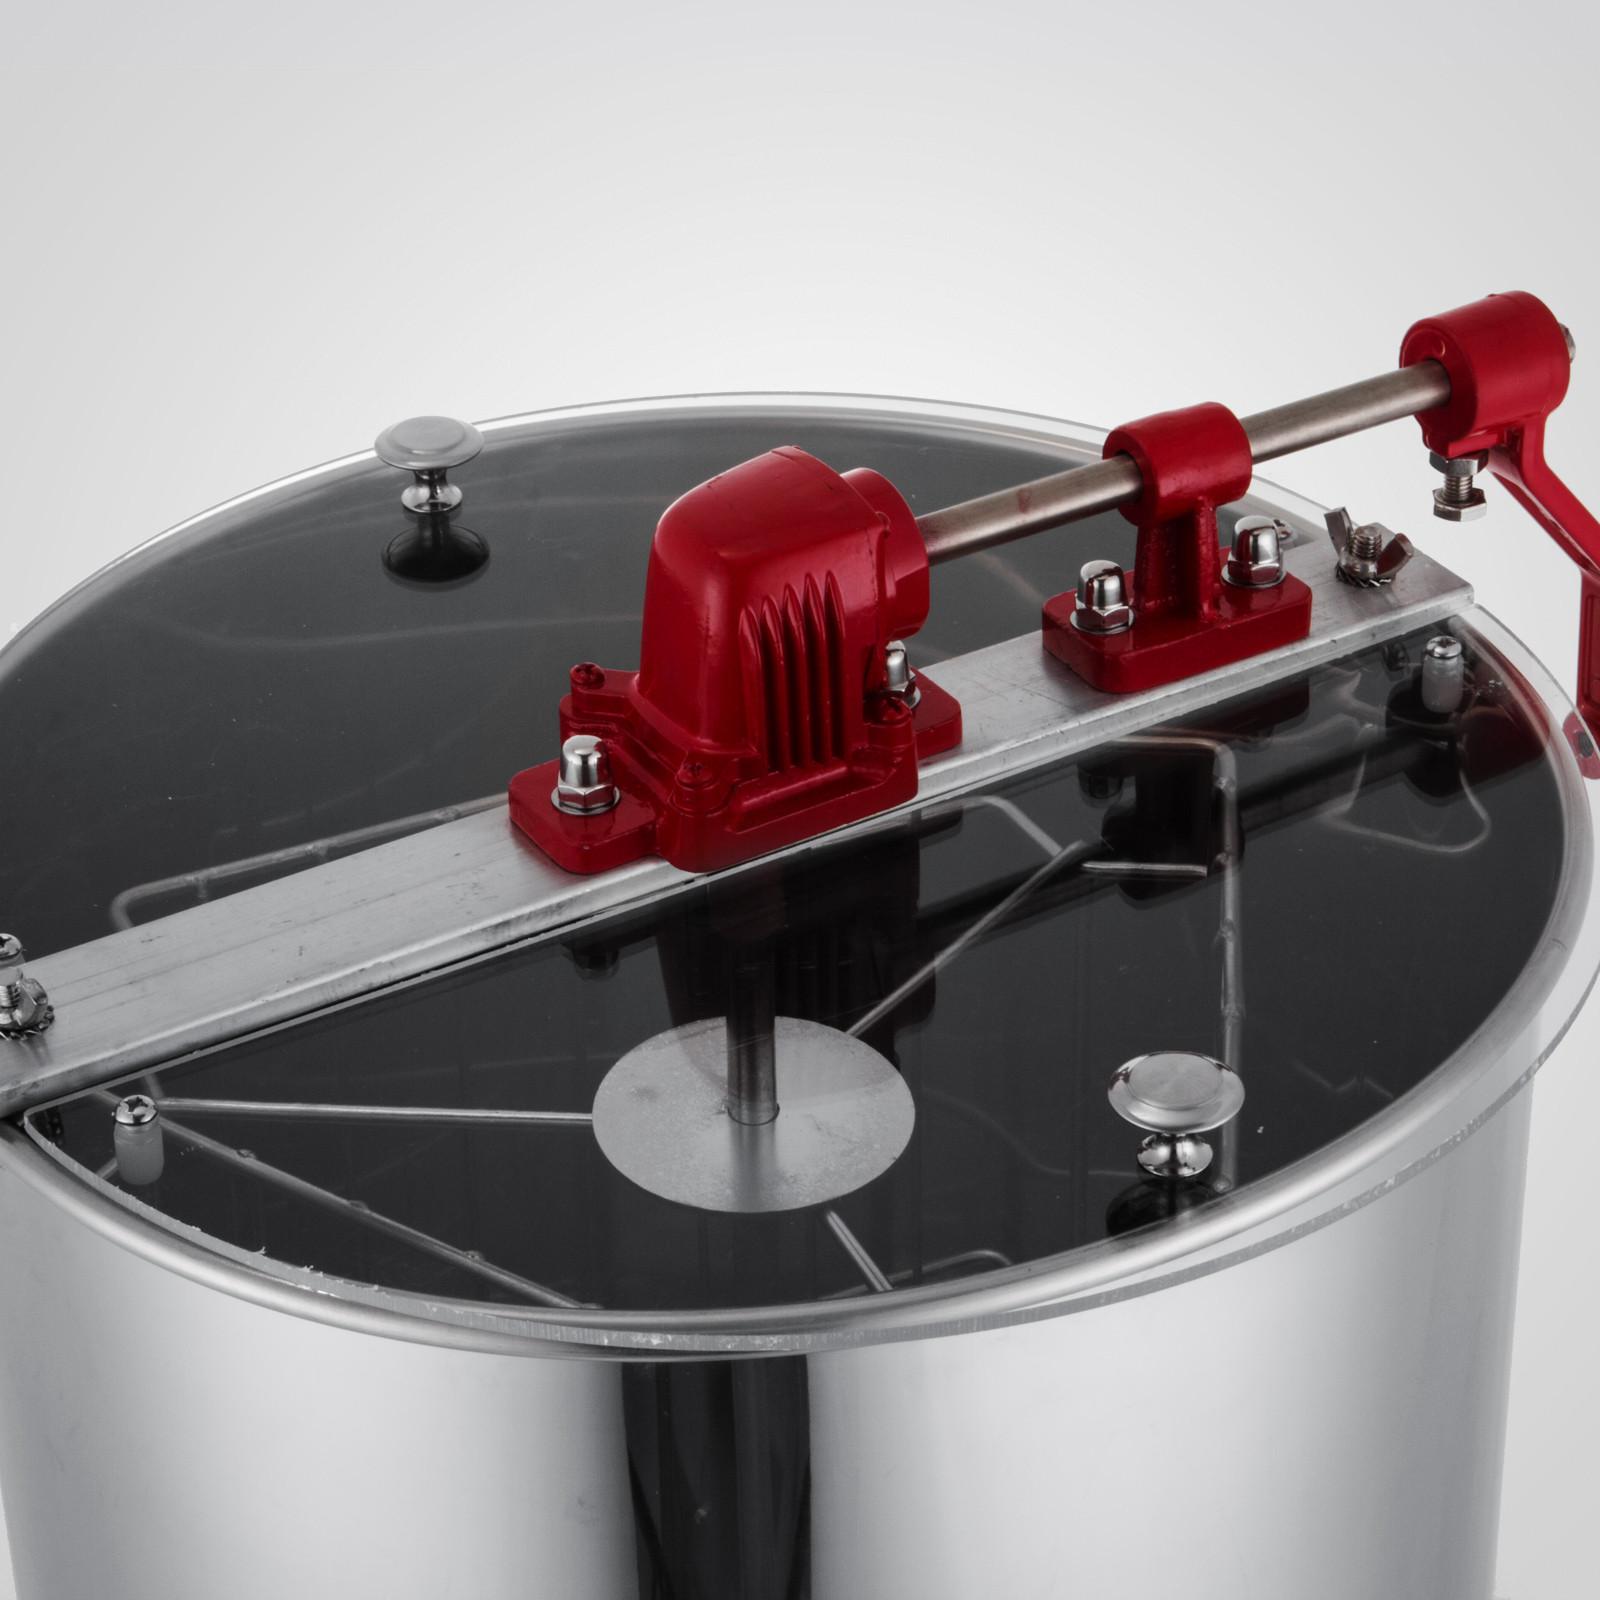 Extracteur-de-Miel-Electrique-manuelle-2-3-4-Cadres-En-Acier-Inox-Centrifugeuse miniature 55